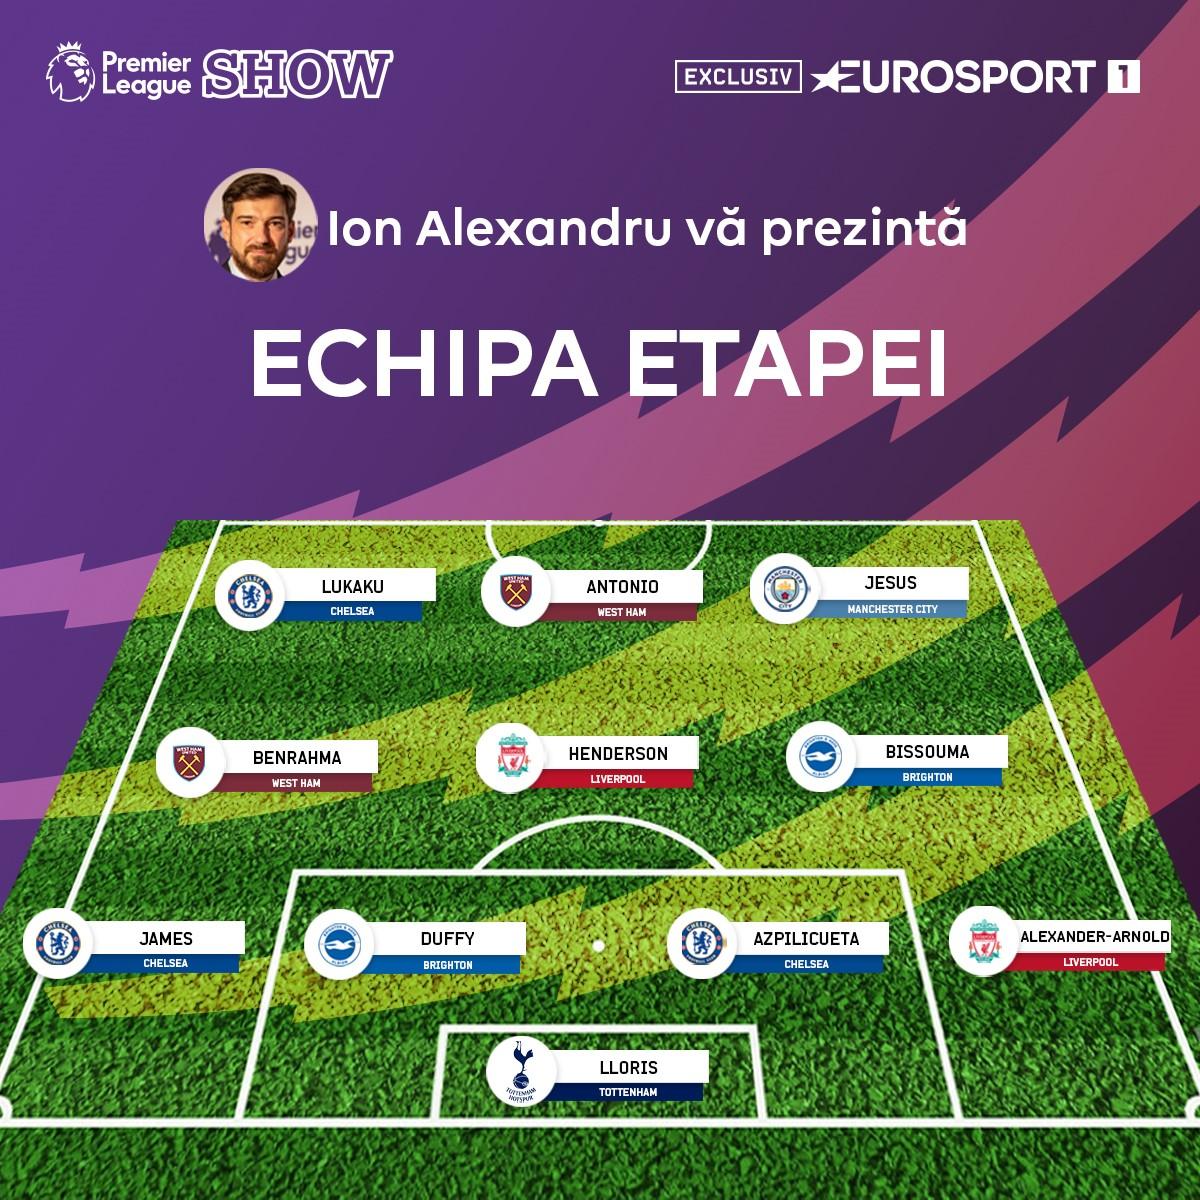 https://i.eurosport.com/2021/08/24/3206185.jpg